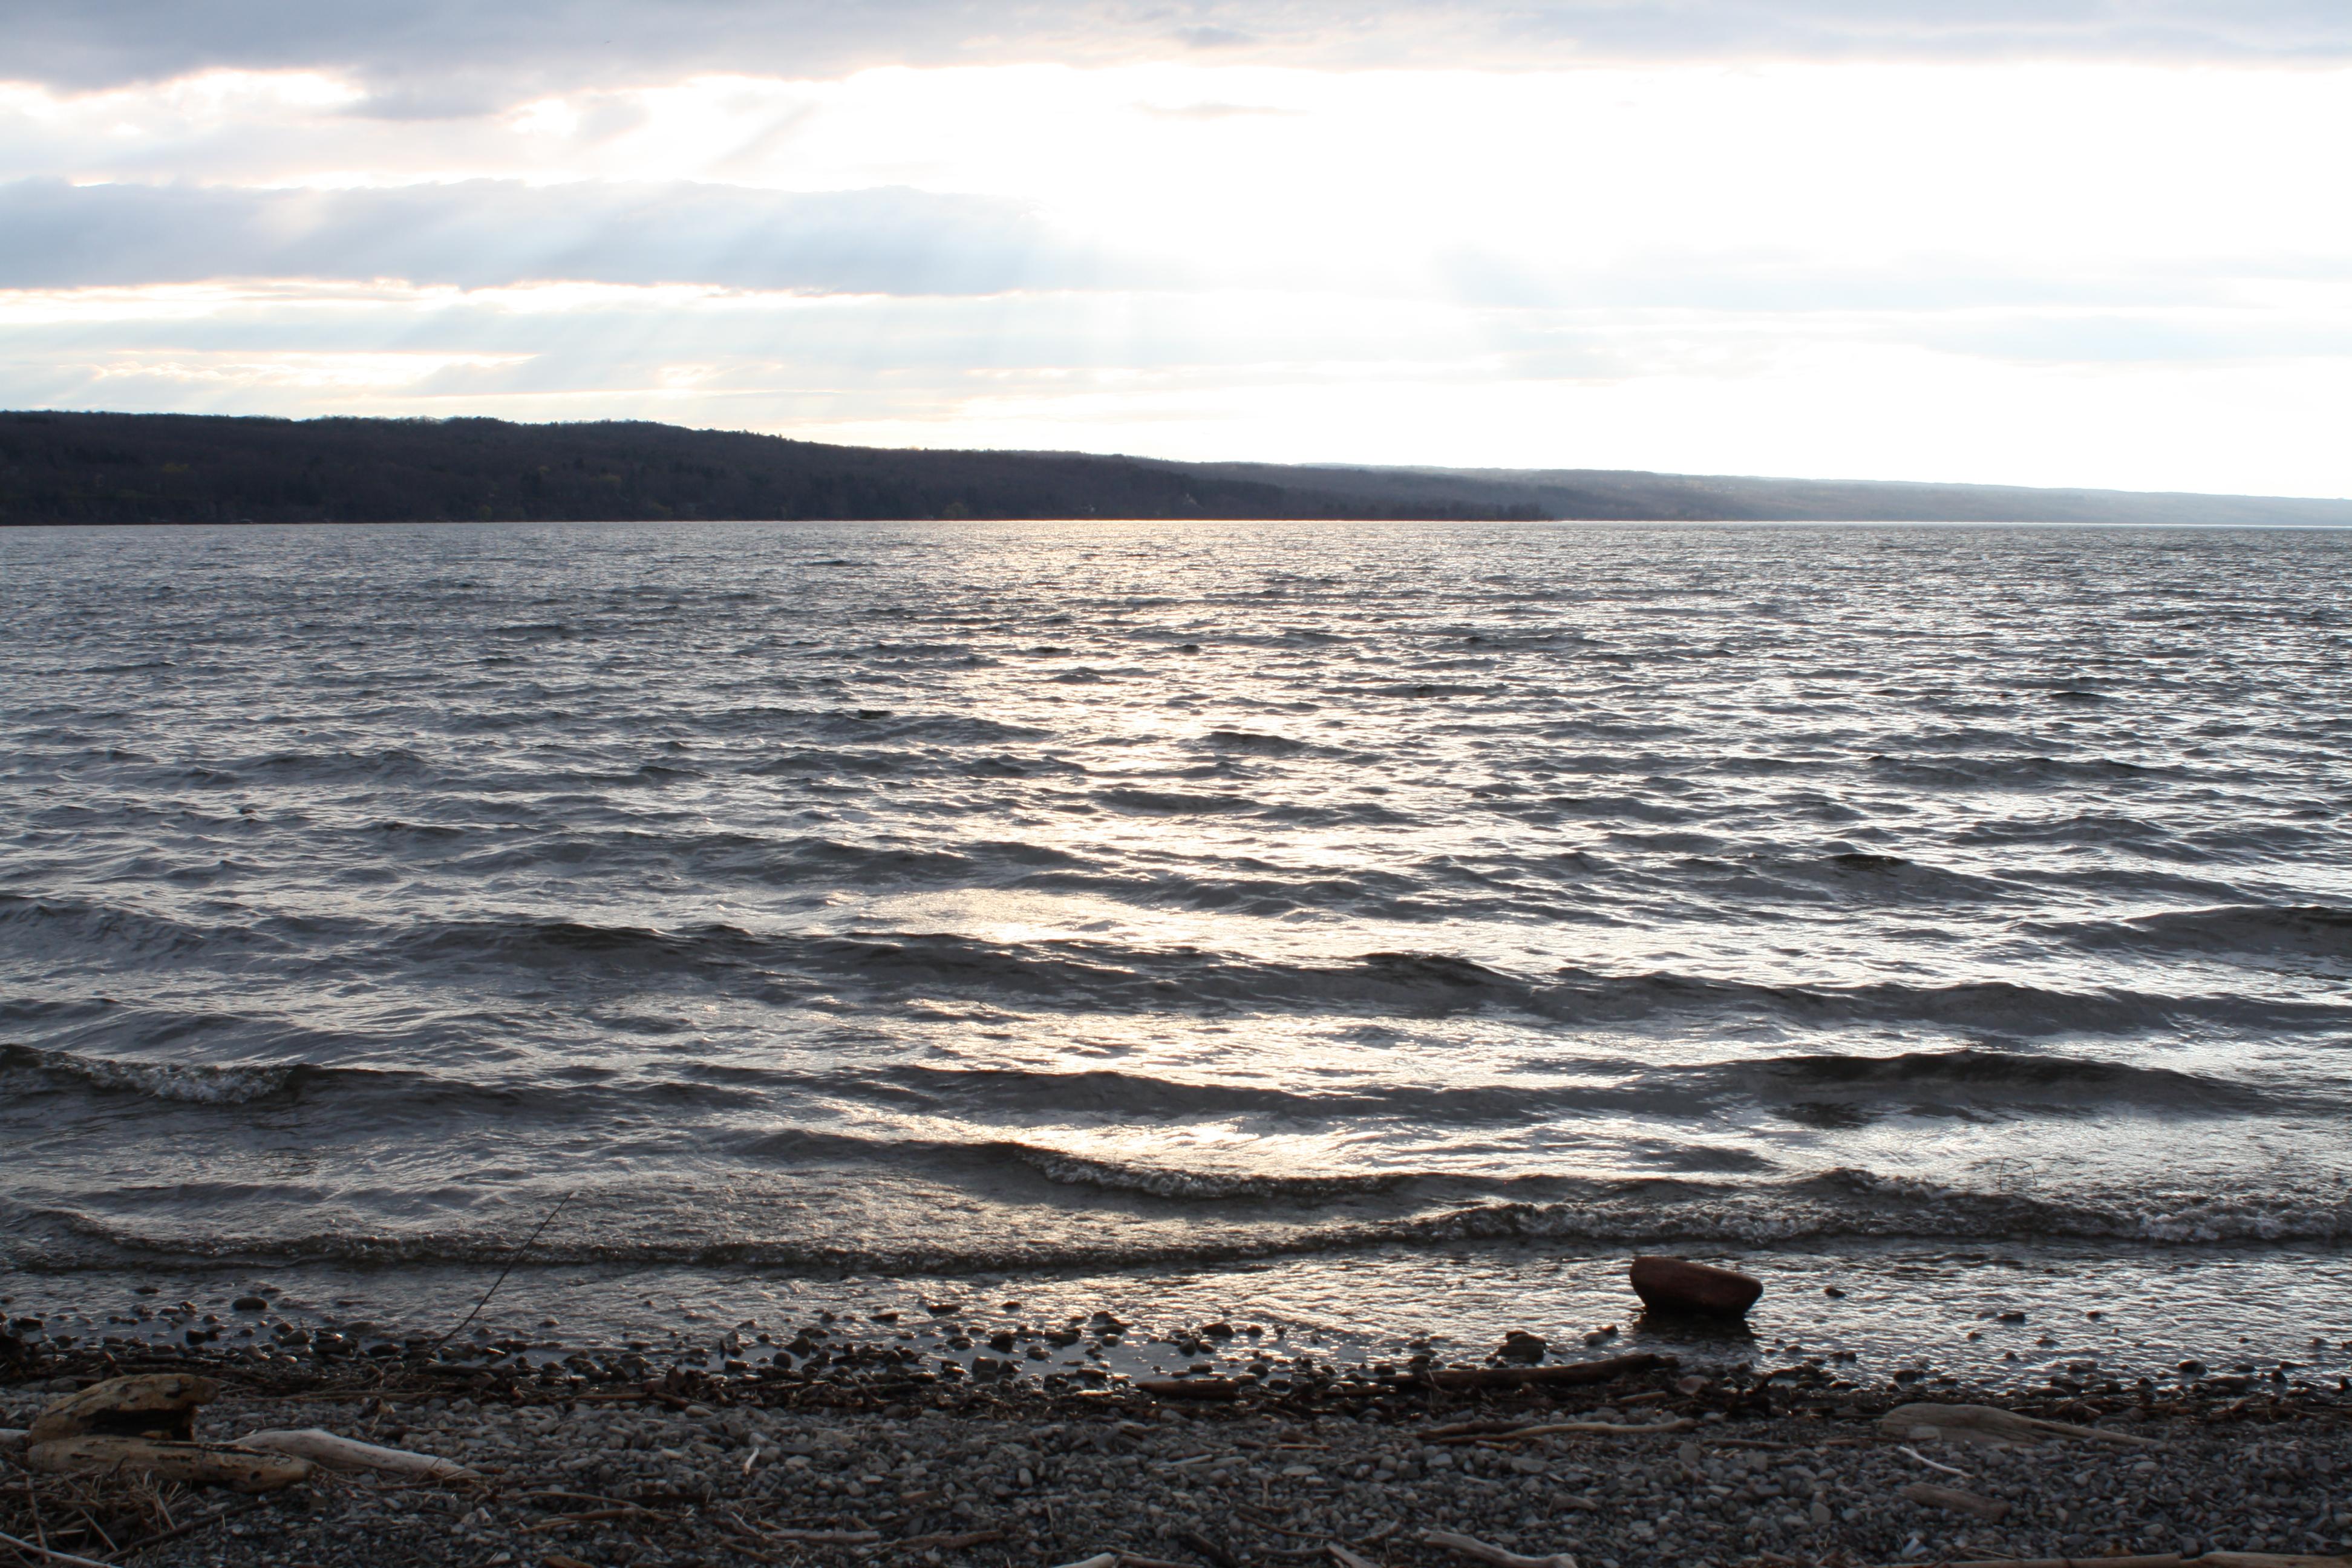 Sunset on Cayuga Lake | standingoutinmyfield